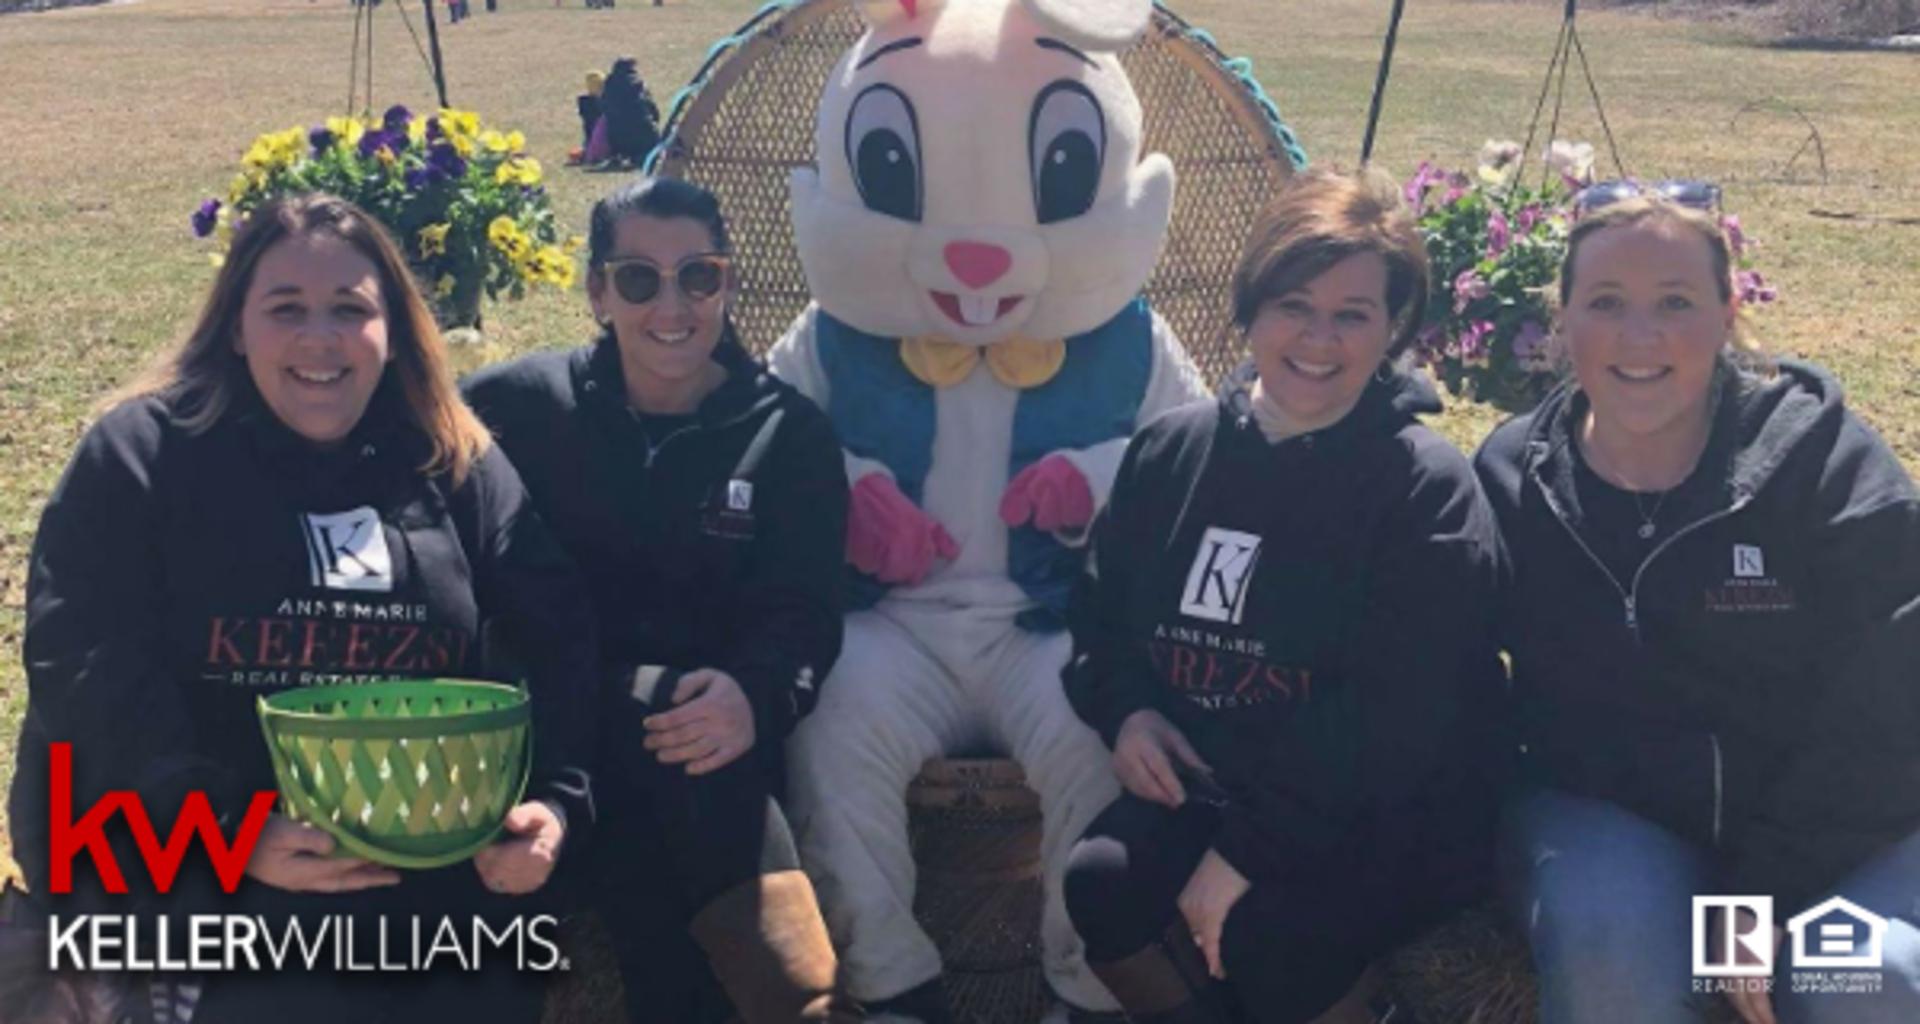 Kerezsi Real Estate Team 3rd Annual Easter Egg Hunt